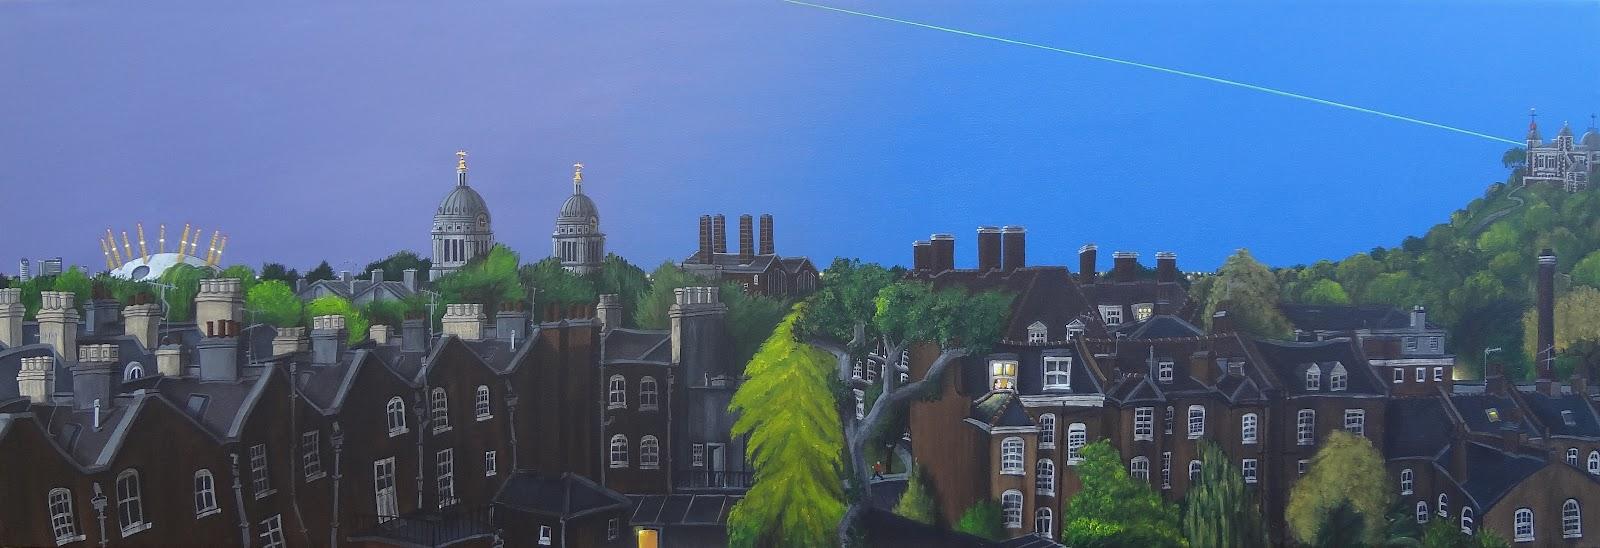 Greenwich Panorama part2